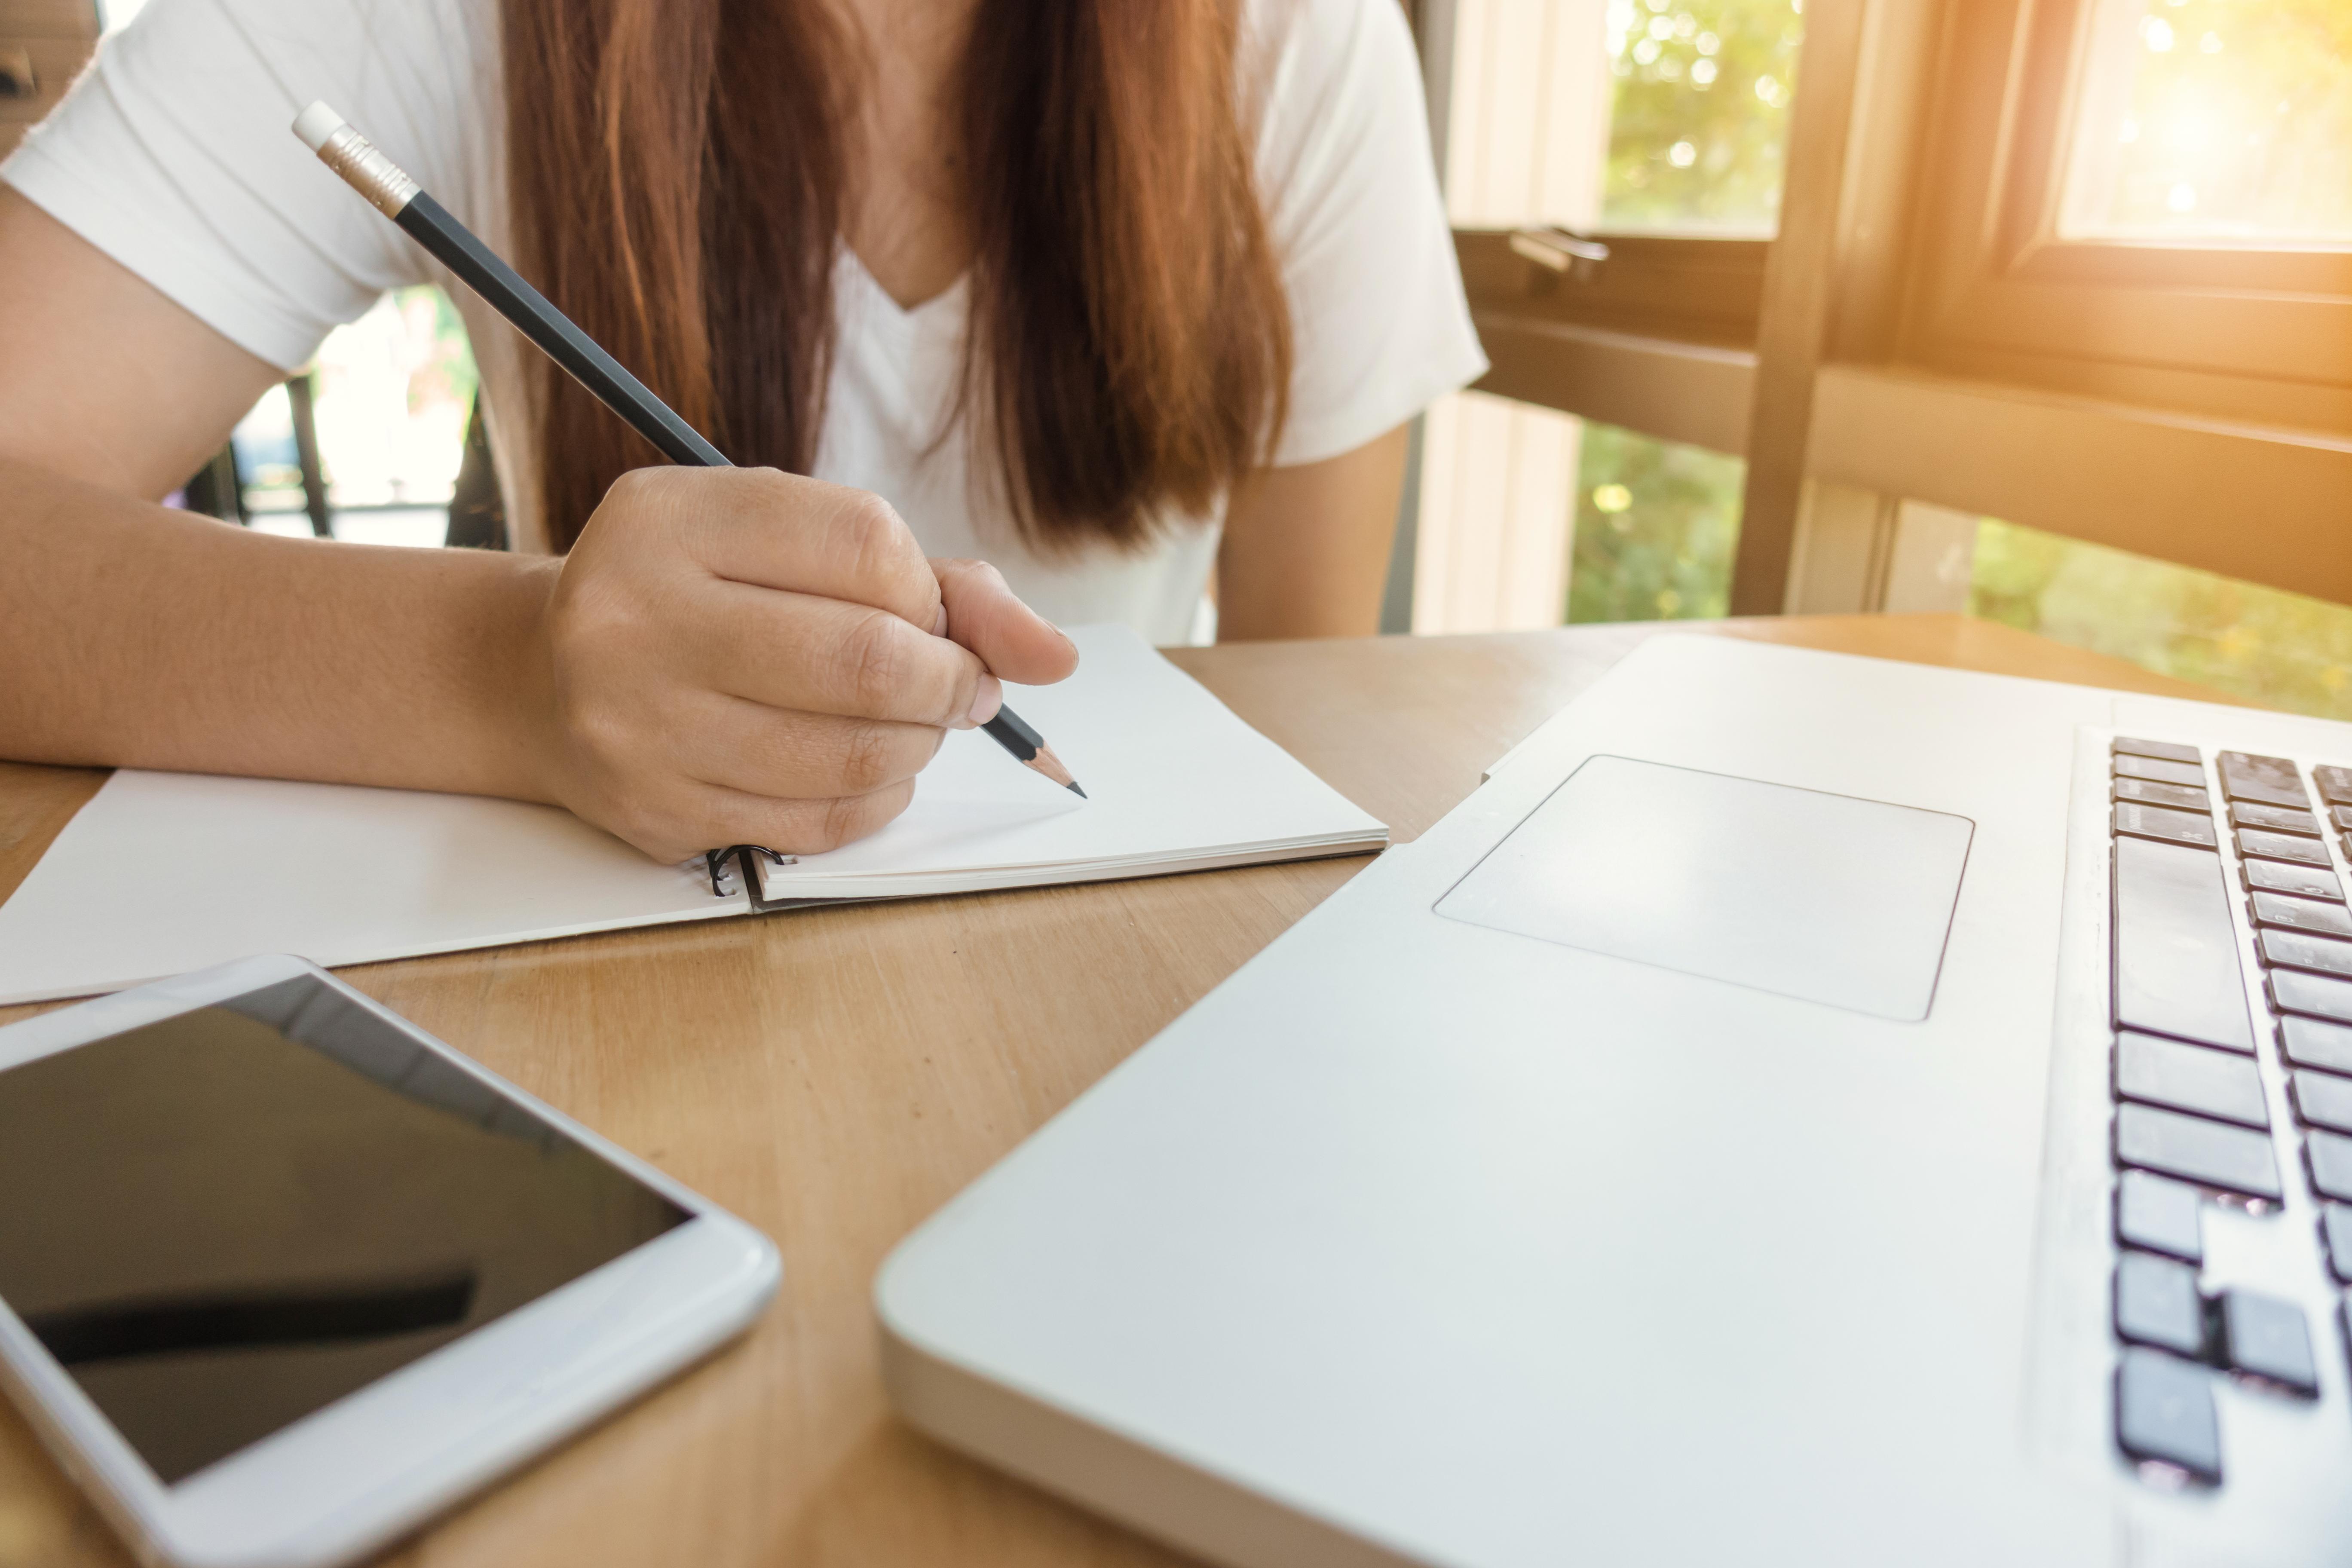 Keuntungan kuliah daring - fleksibel